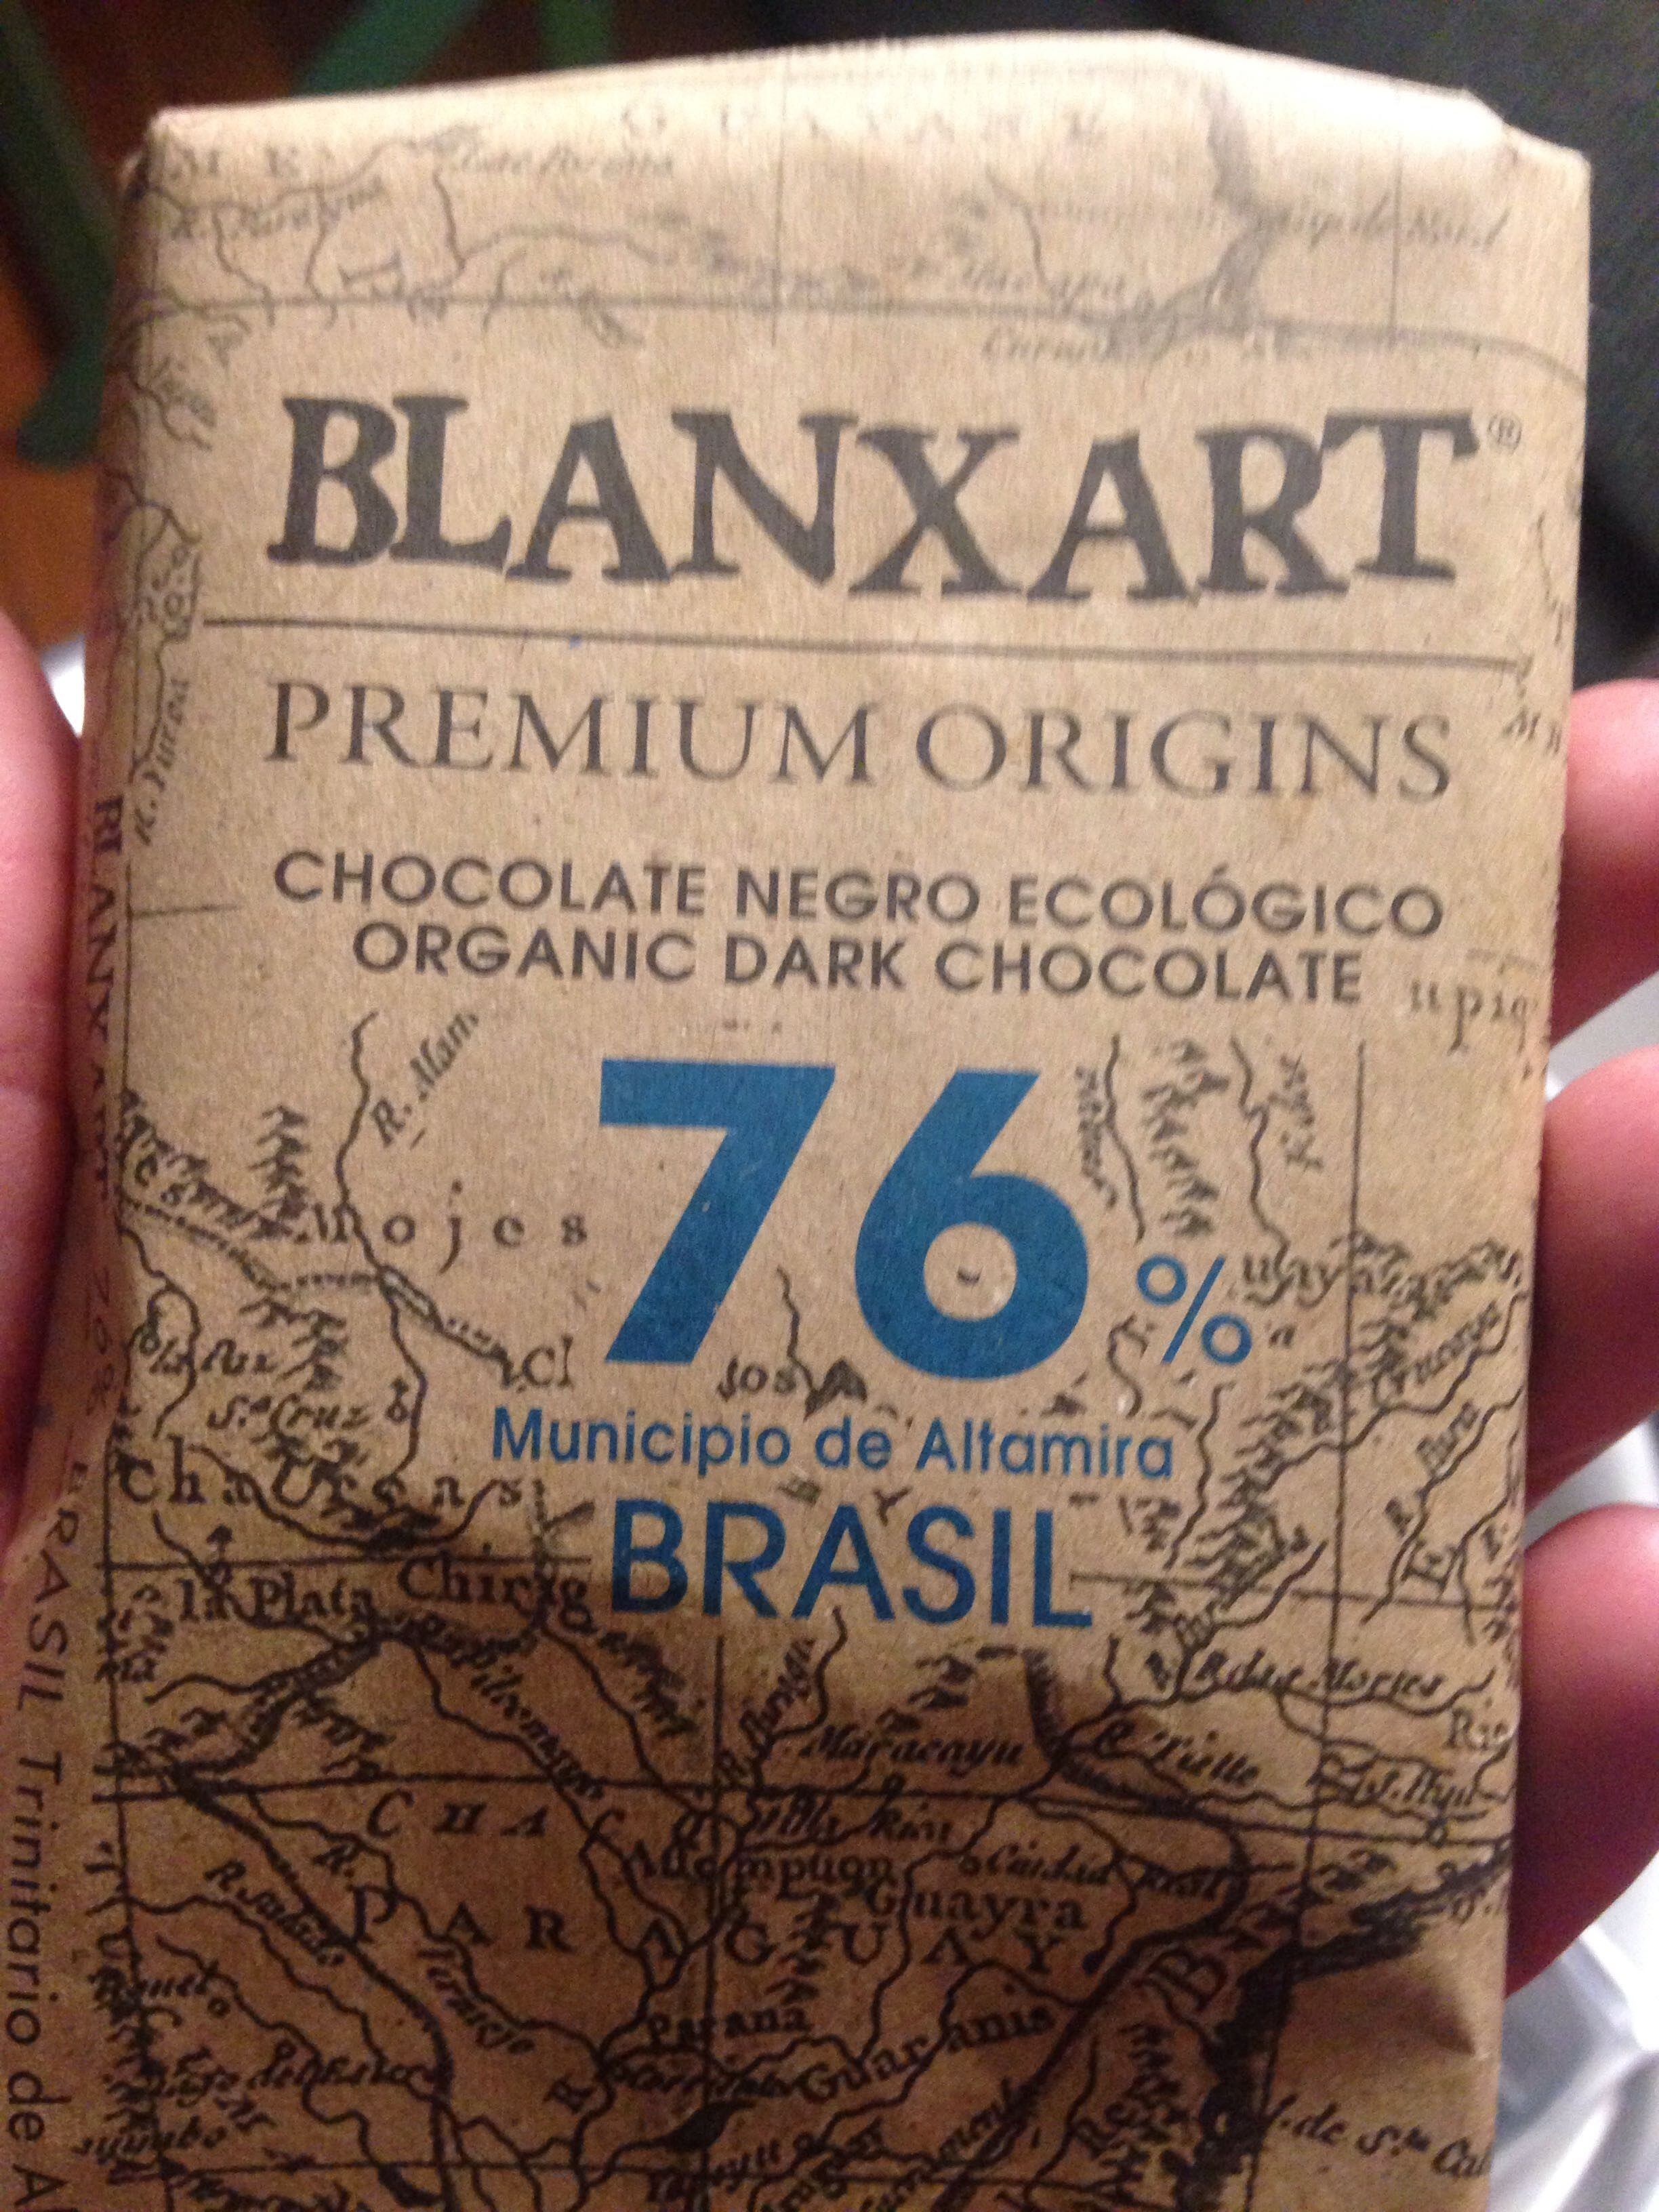 Chocolate negro ecologico - Product